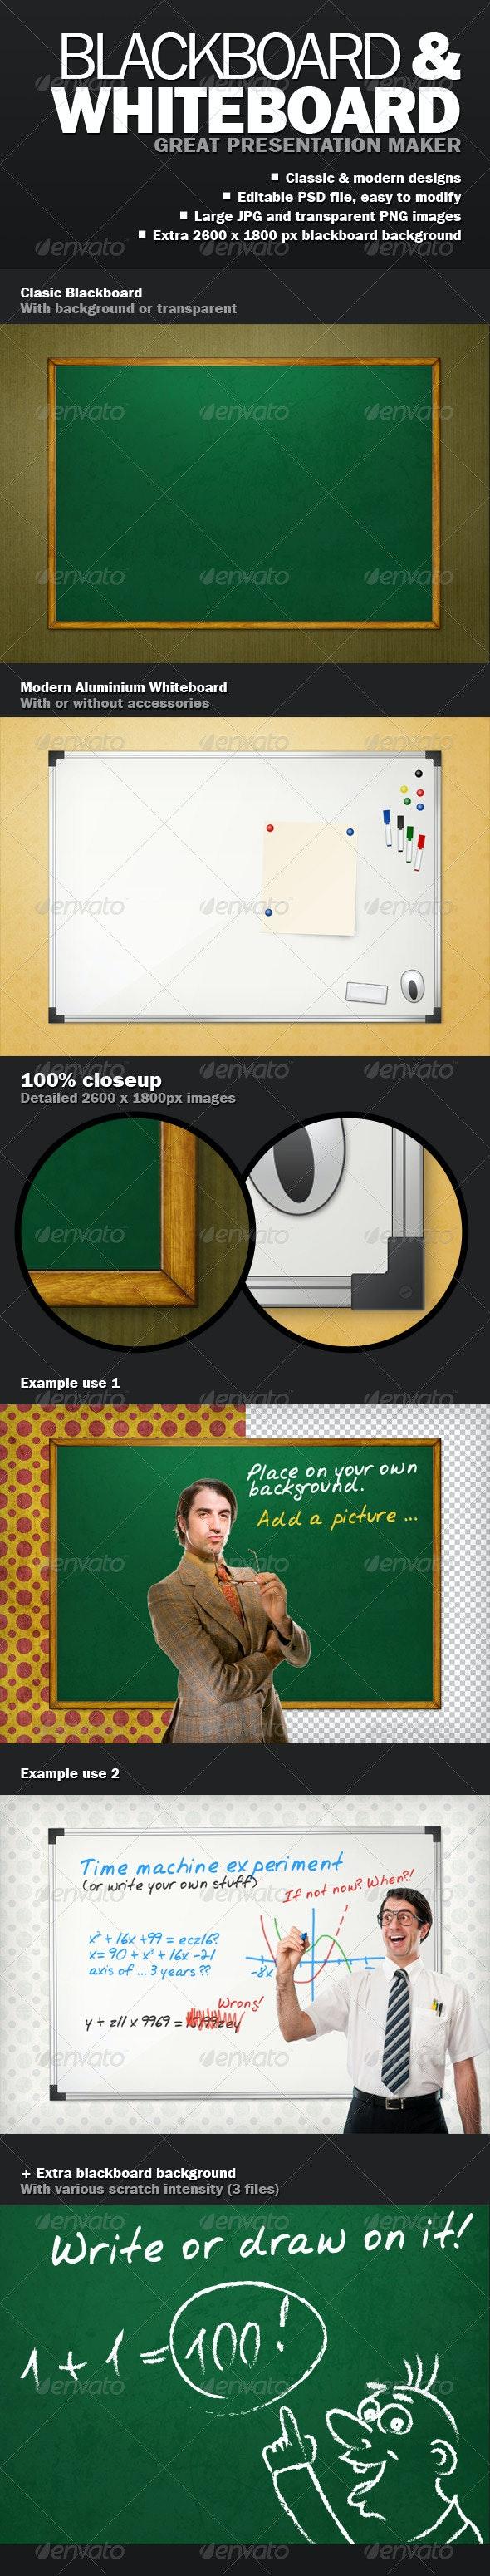 Blackboard Whiteboard Presentation Maker - Business Illustrations